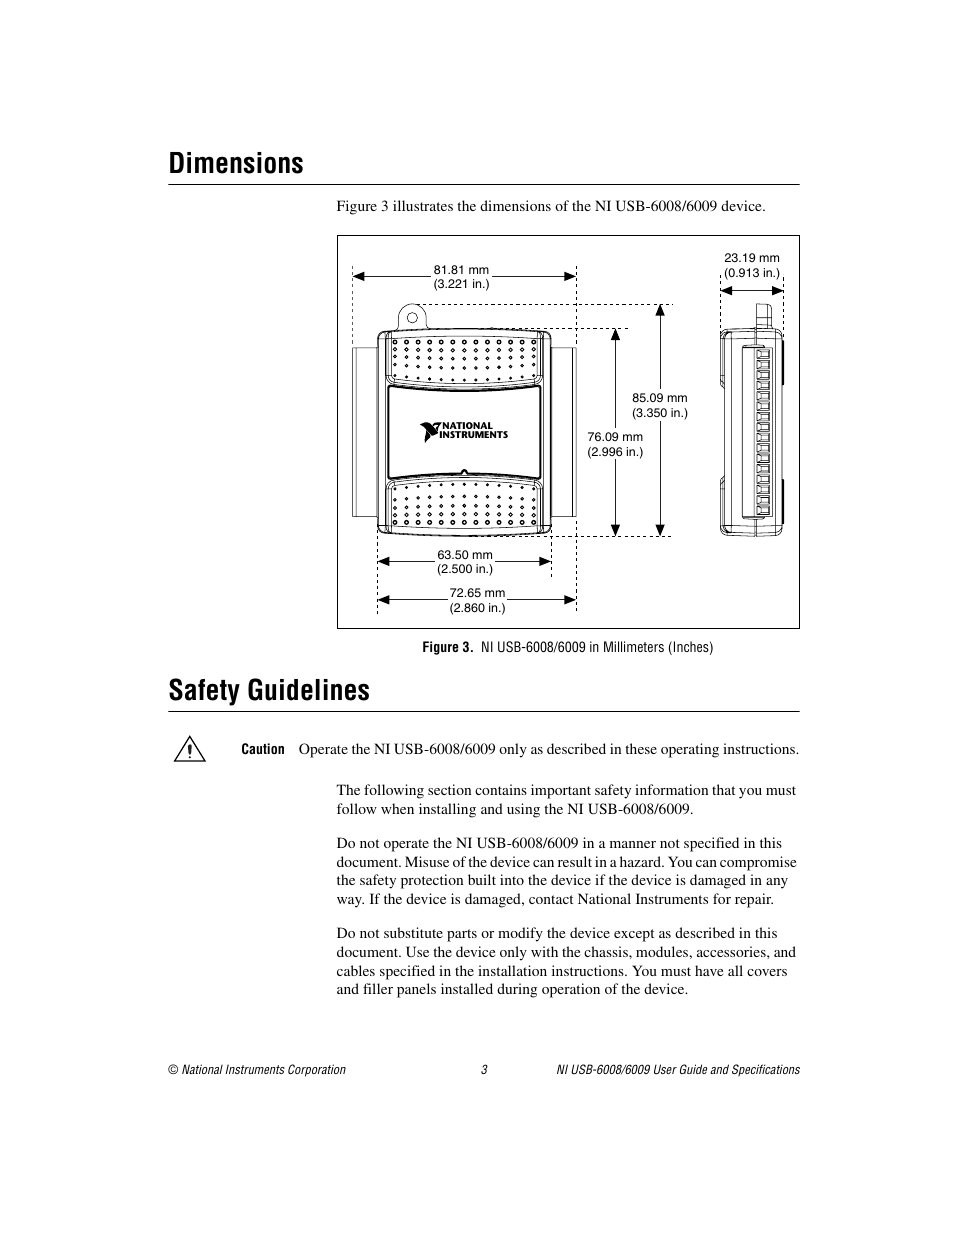 dimensions figure 3 ni usb 6008 6009 in millimeters inches rh manualsdir com Rollei 6008 Review ni usb 6008 user guide